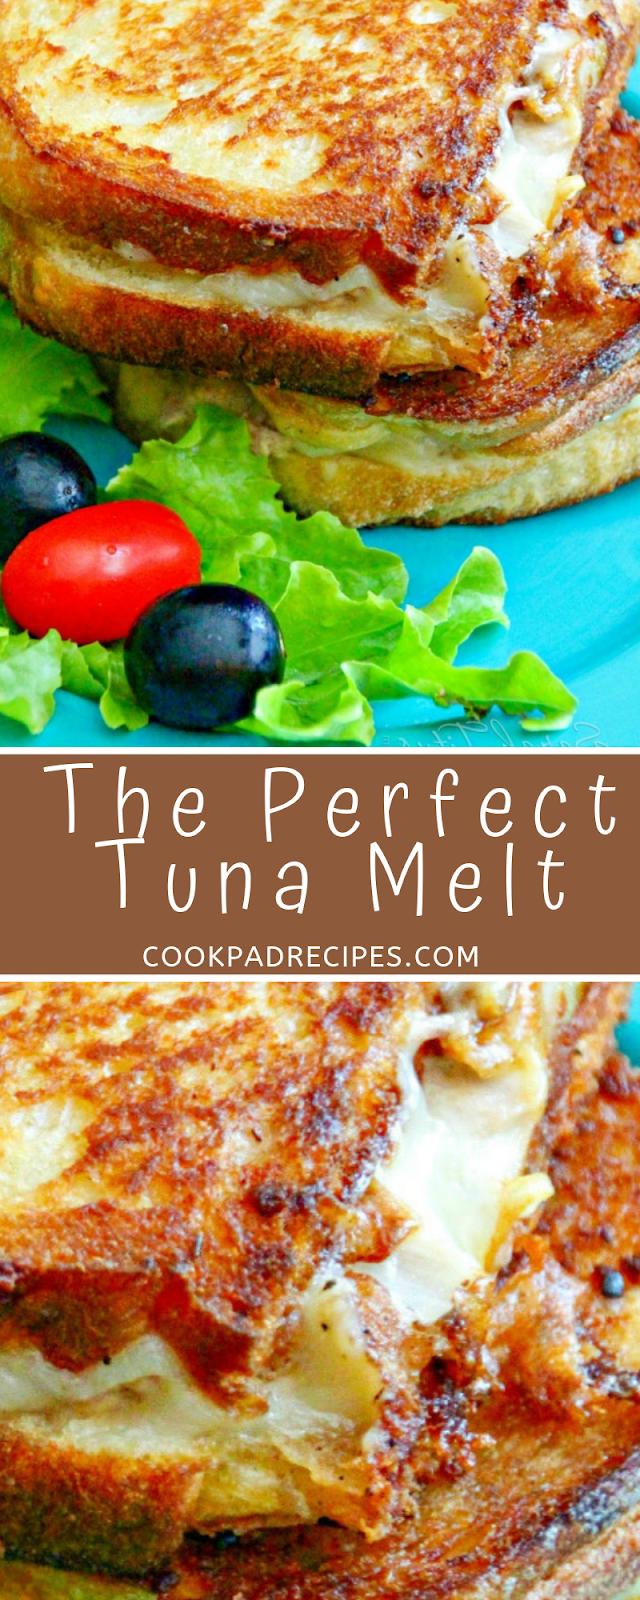 The Pеrfесt Tuna Mеlt